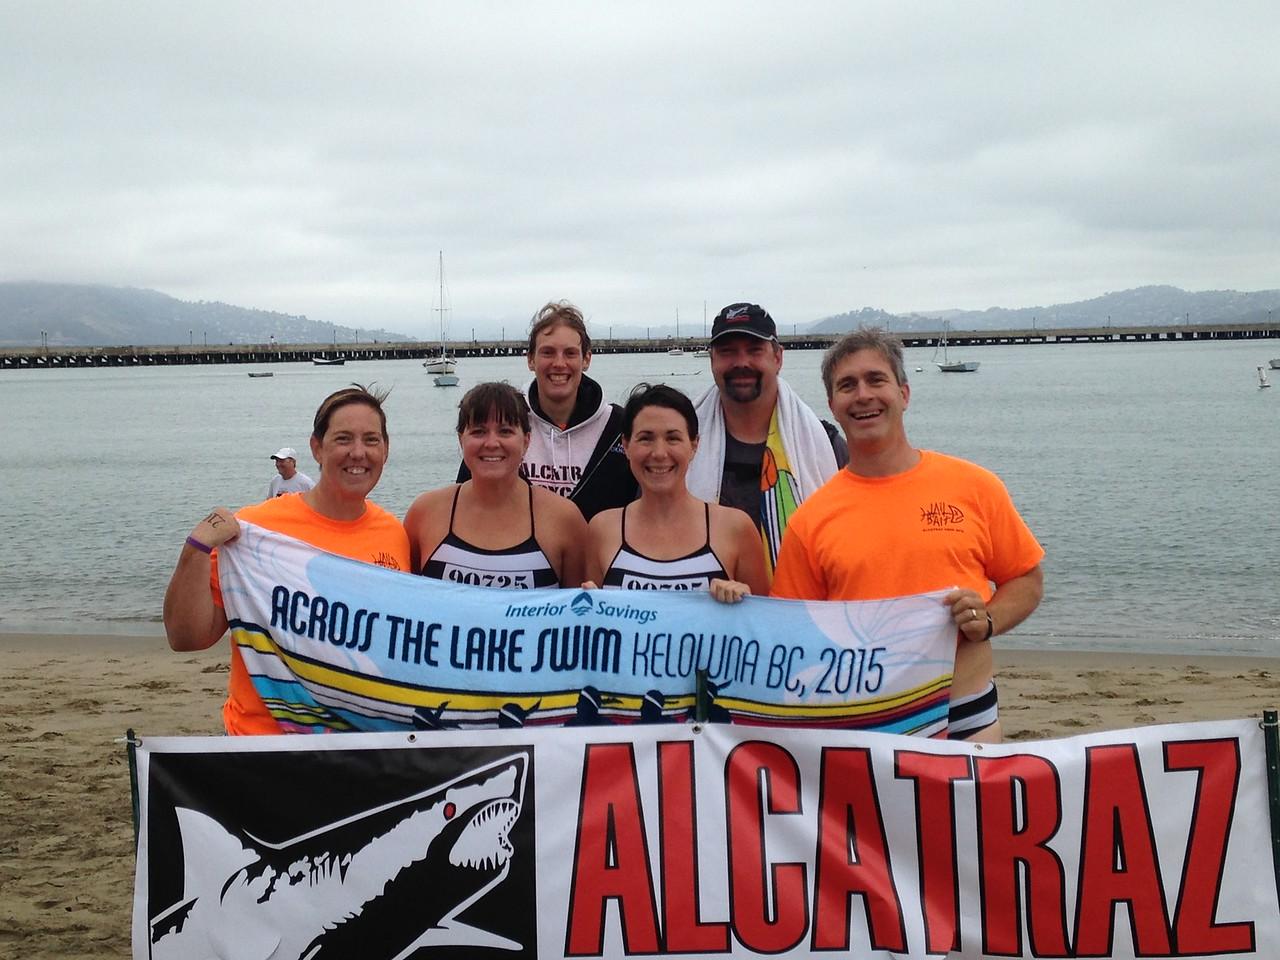 Alcatraz swim team and their towel